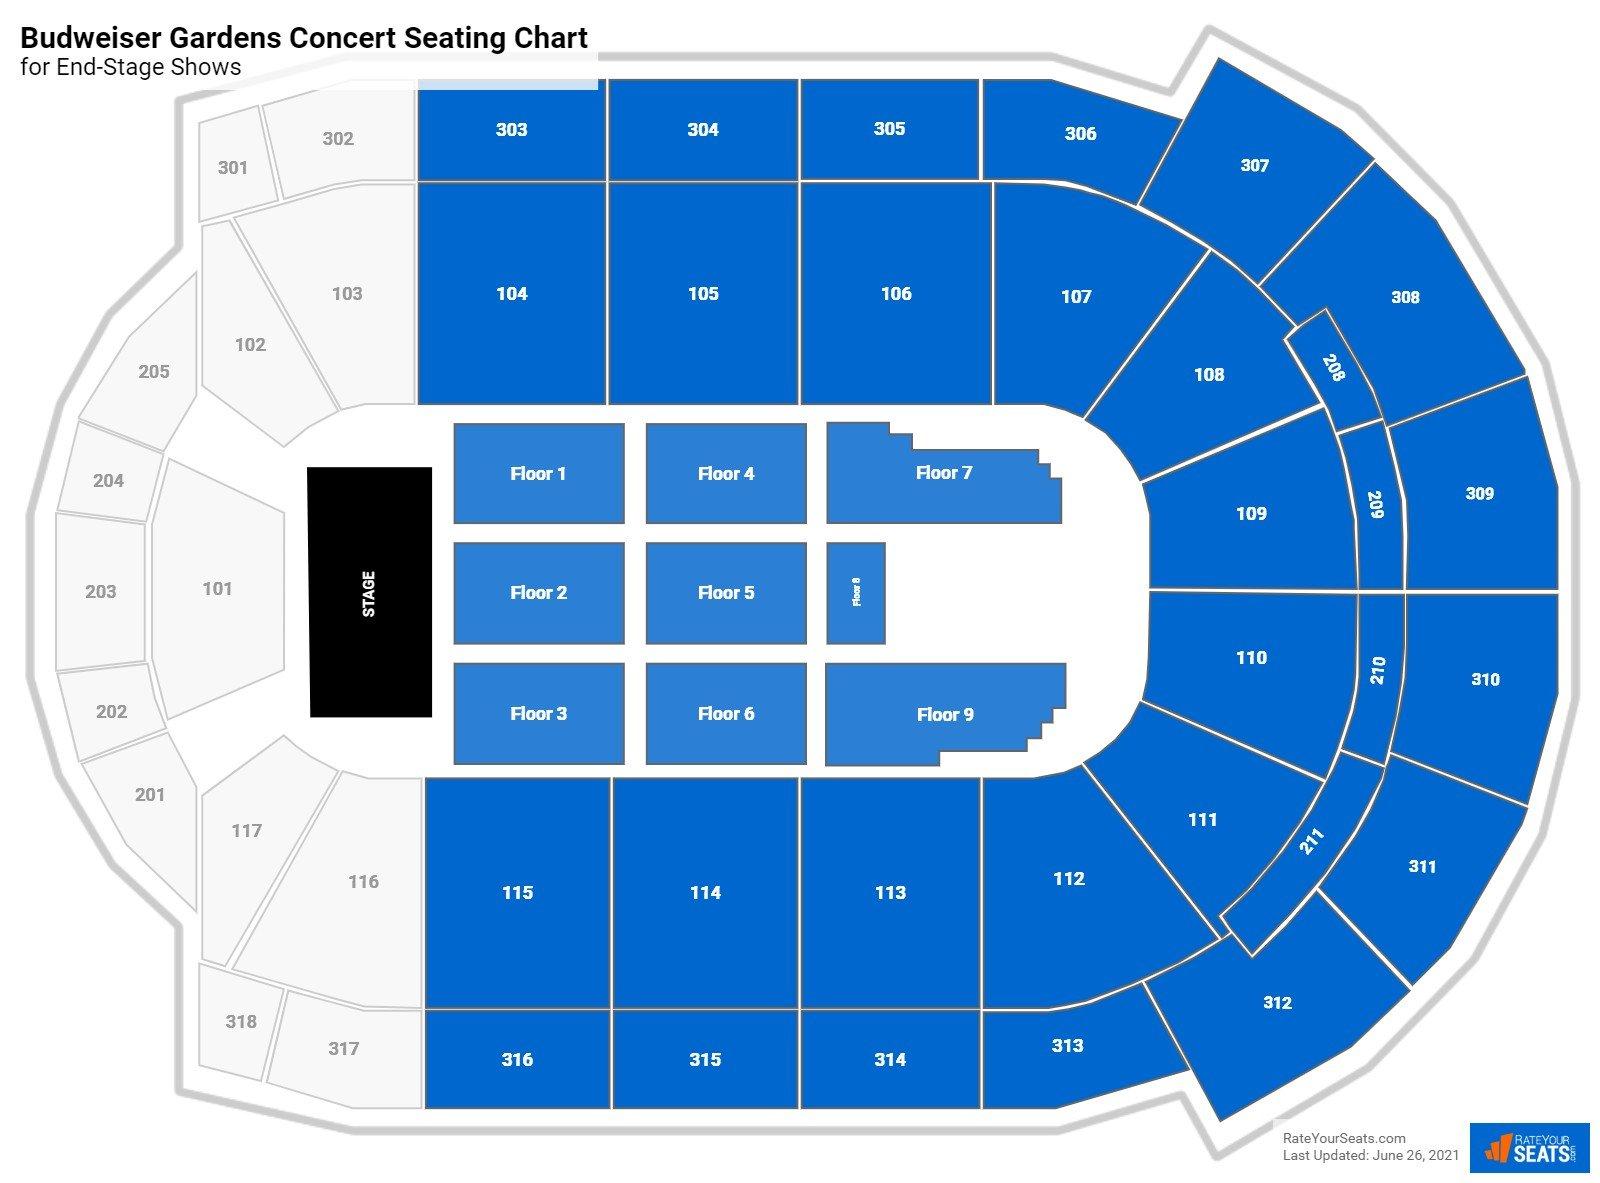 Budweiser Gardens Seating Chart Rateyourseats Com